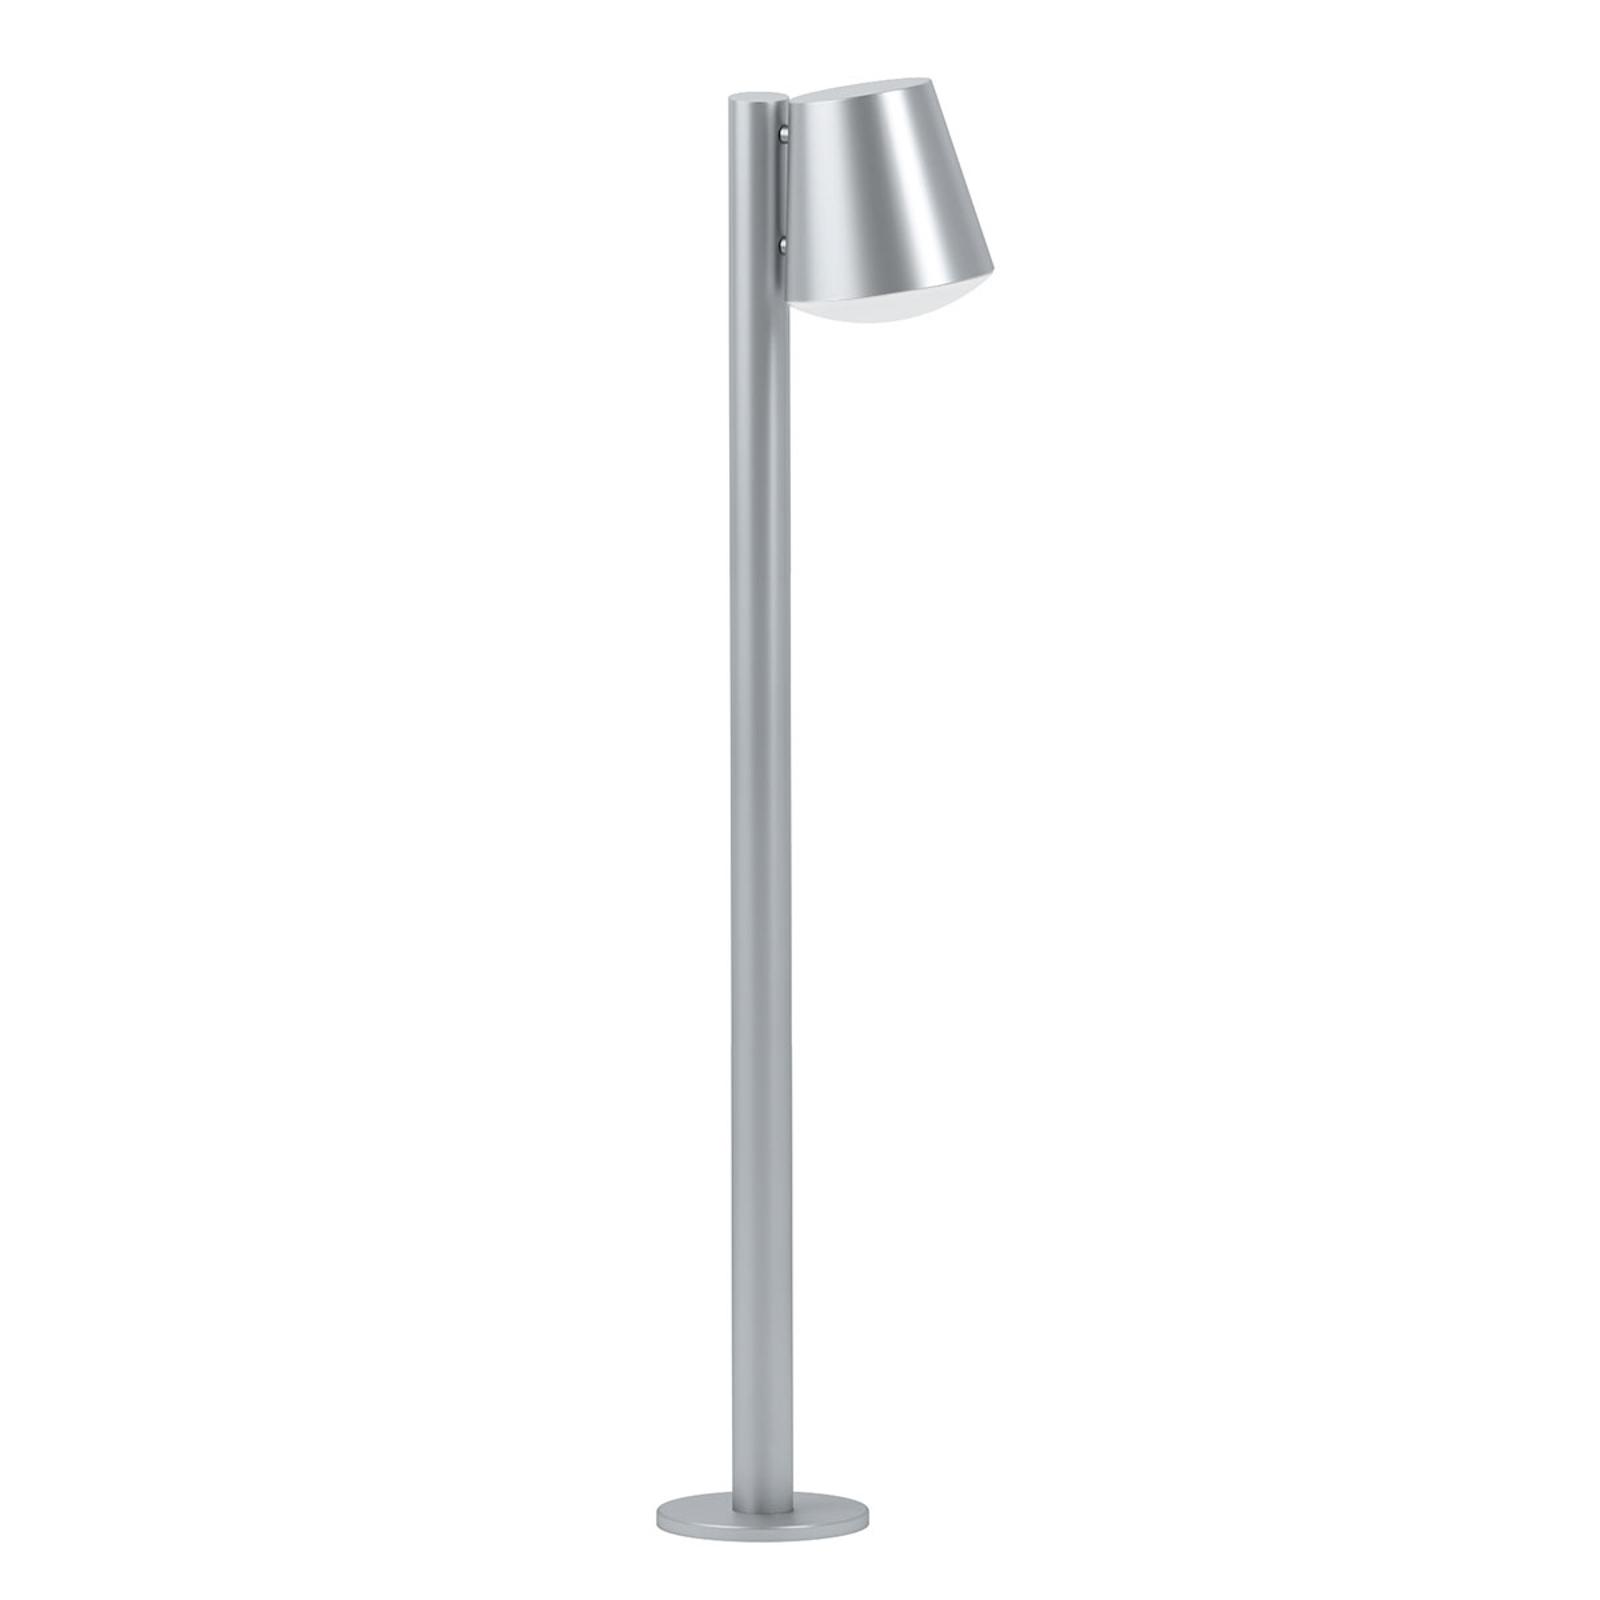 EGLO connect Caldiero-C słupek oświetleniowy LED